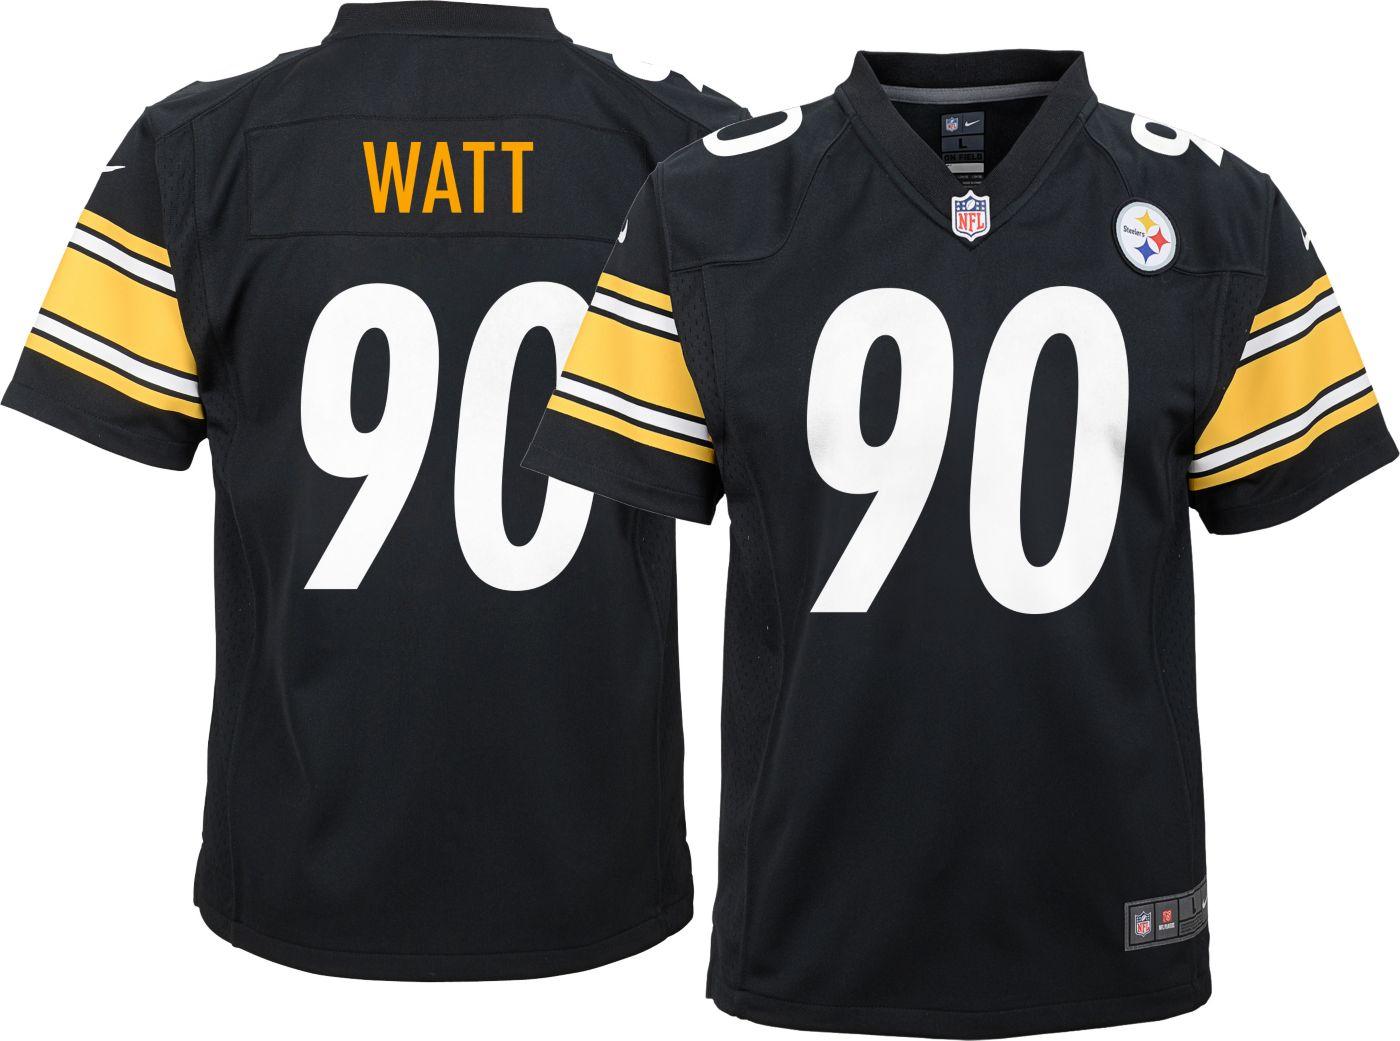 Nike Youth Home Game Jersey Pittsburgh Steelers T.J. Watt #90